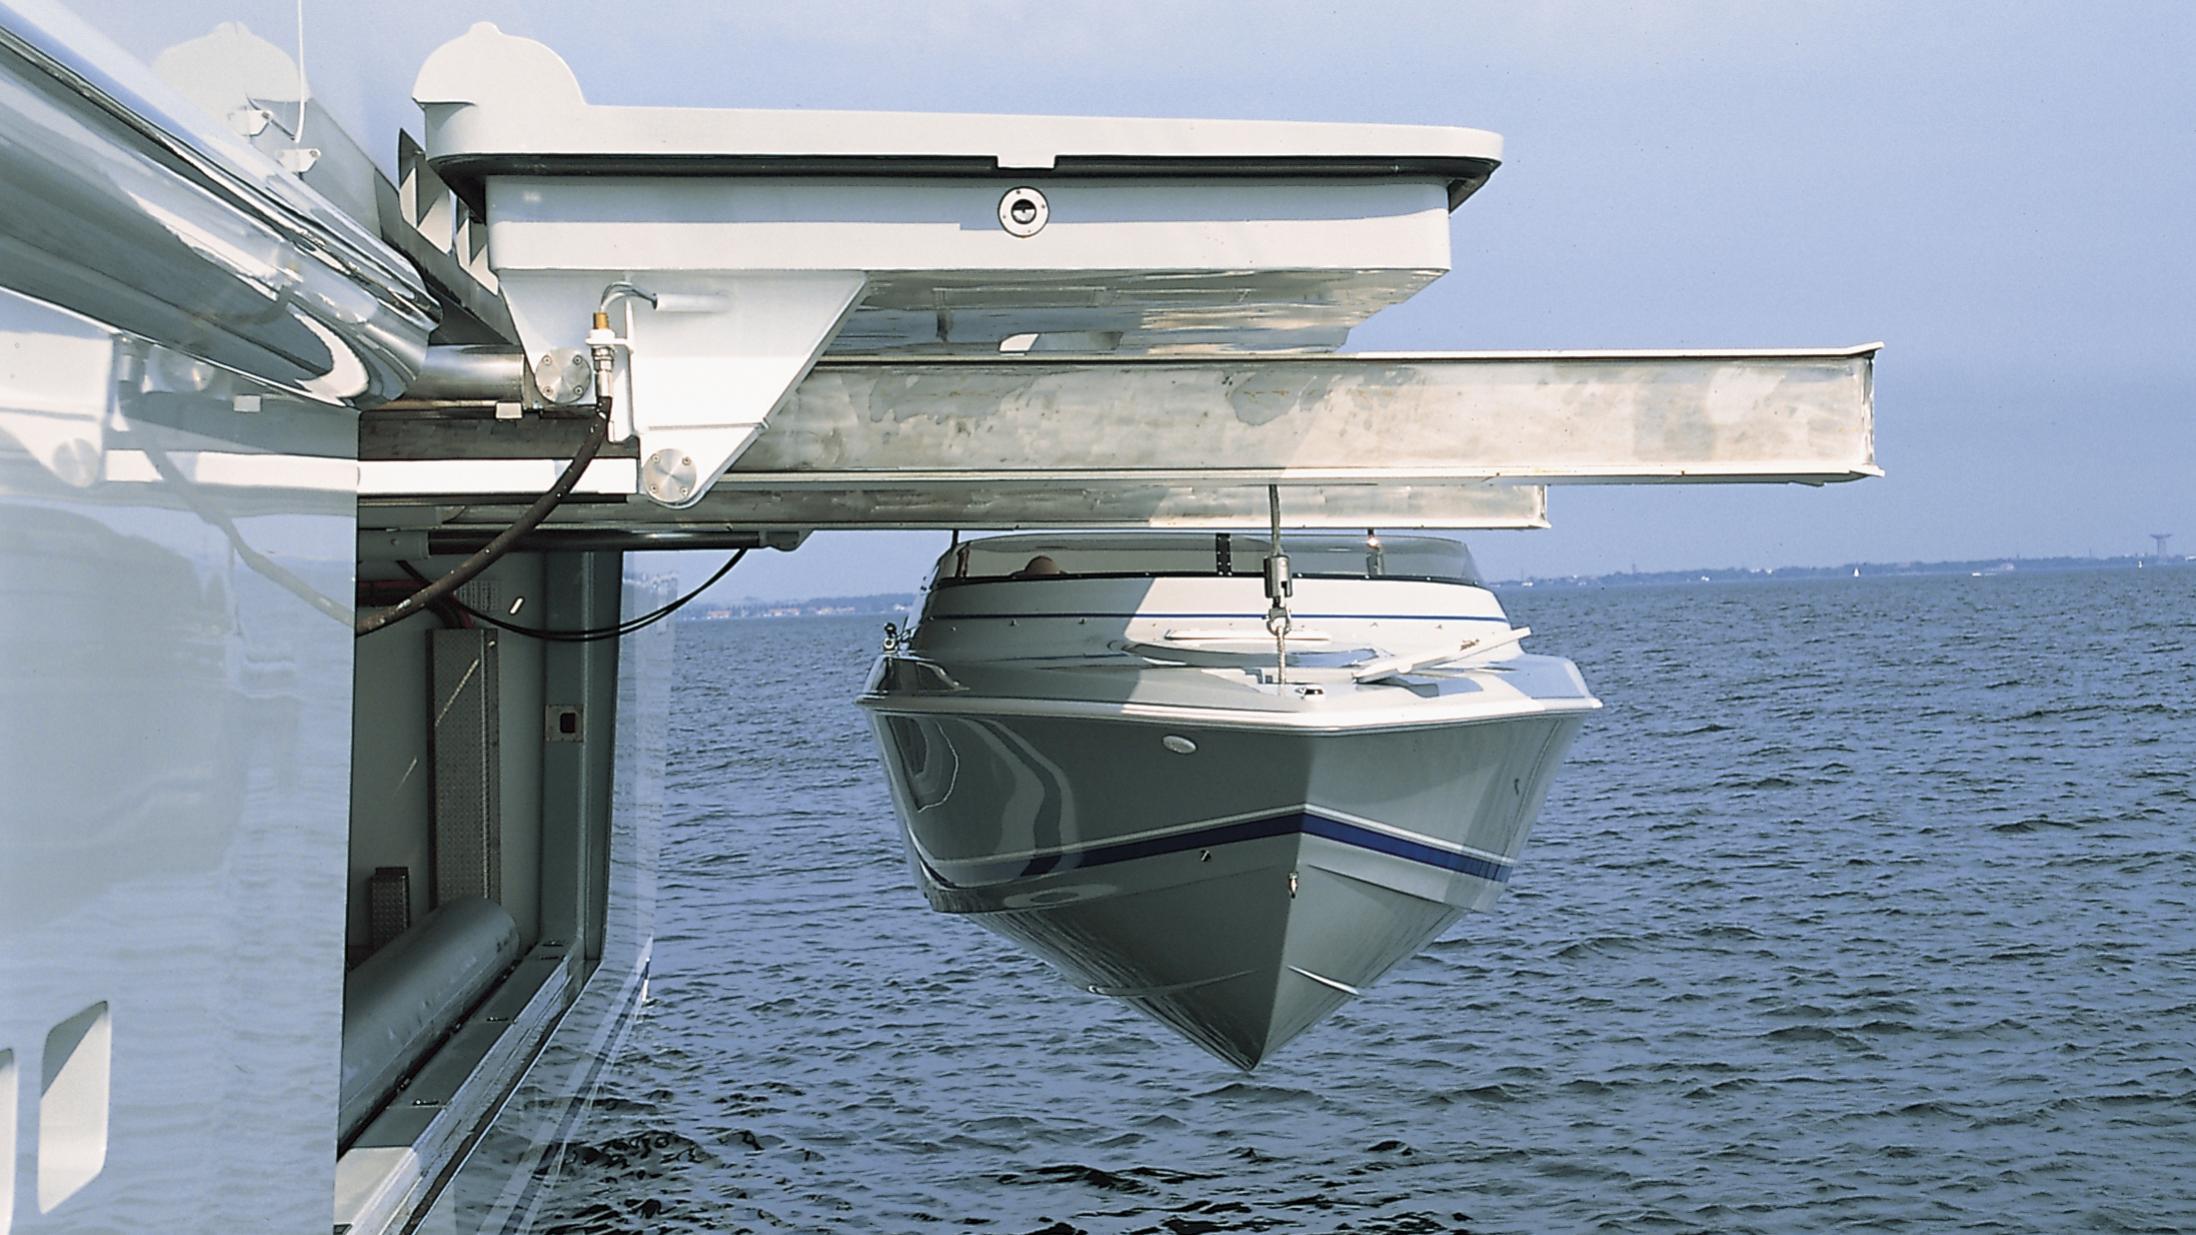 skat-explorer-yacht-lurssen-2002-71m-tender-garage